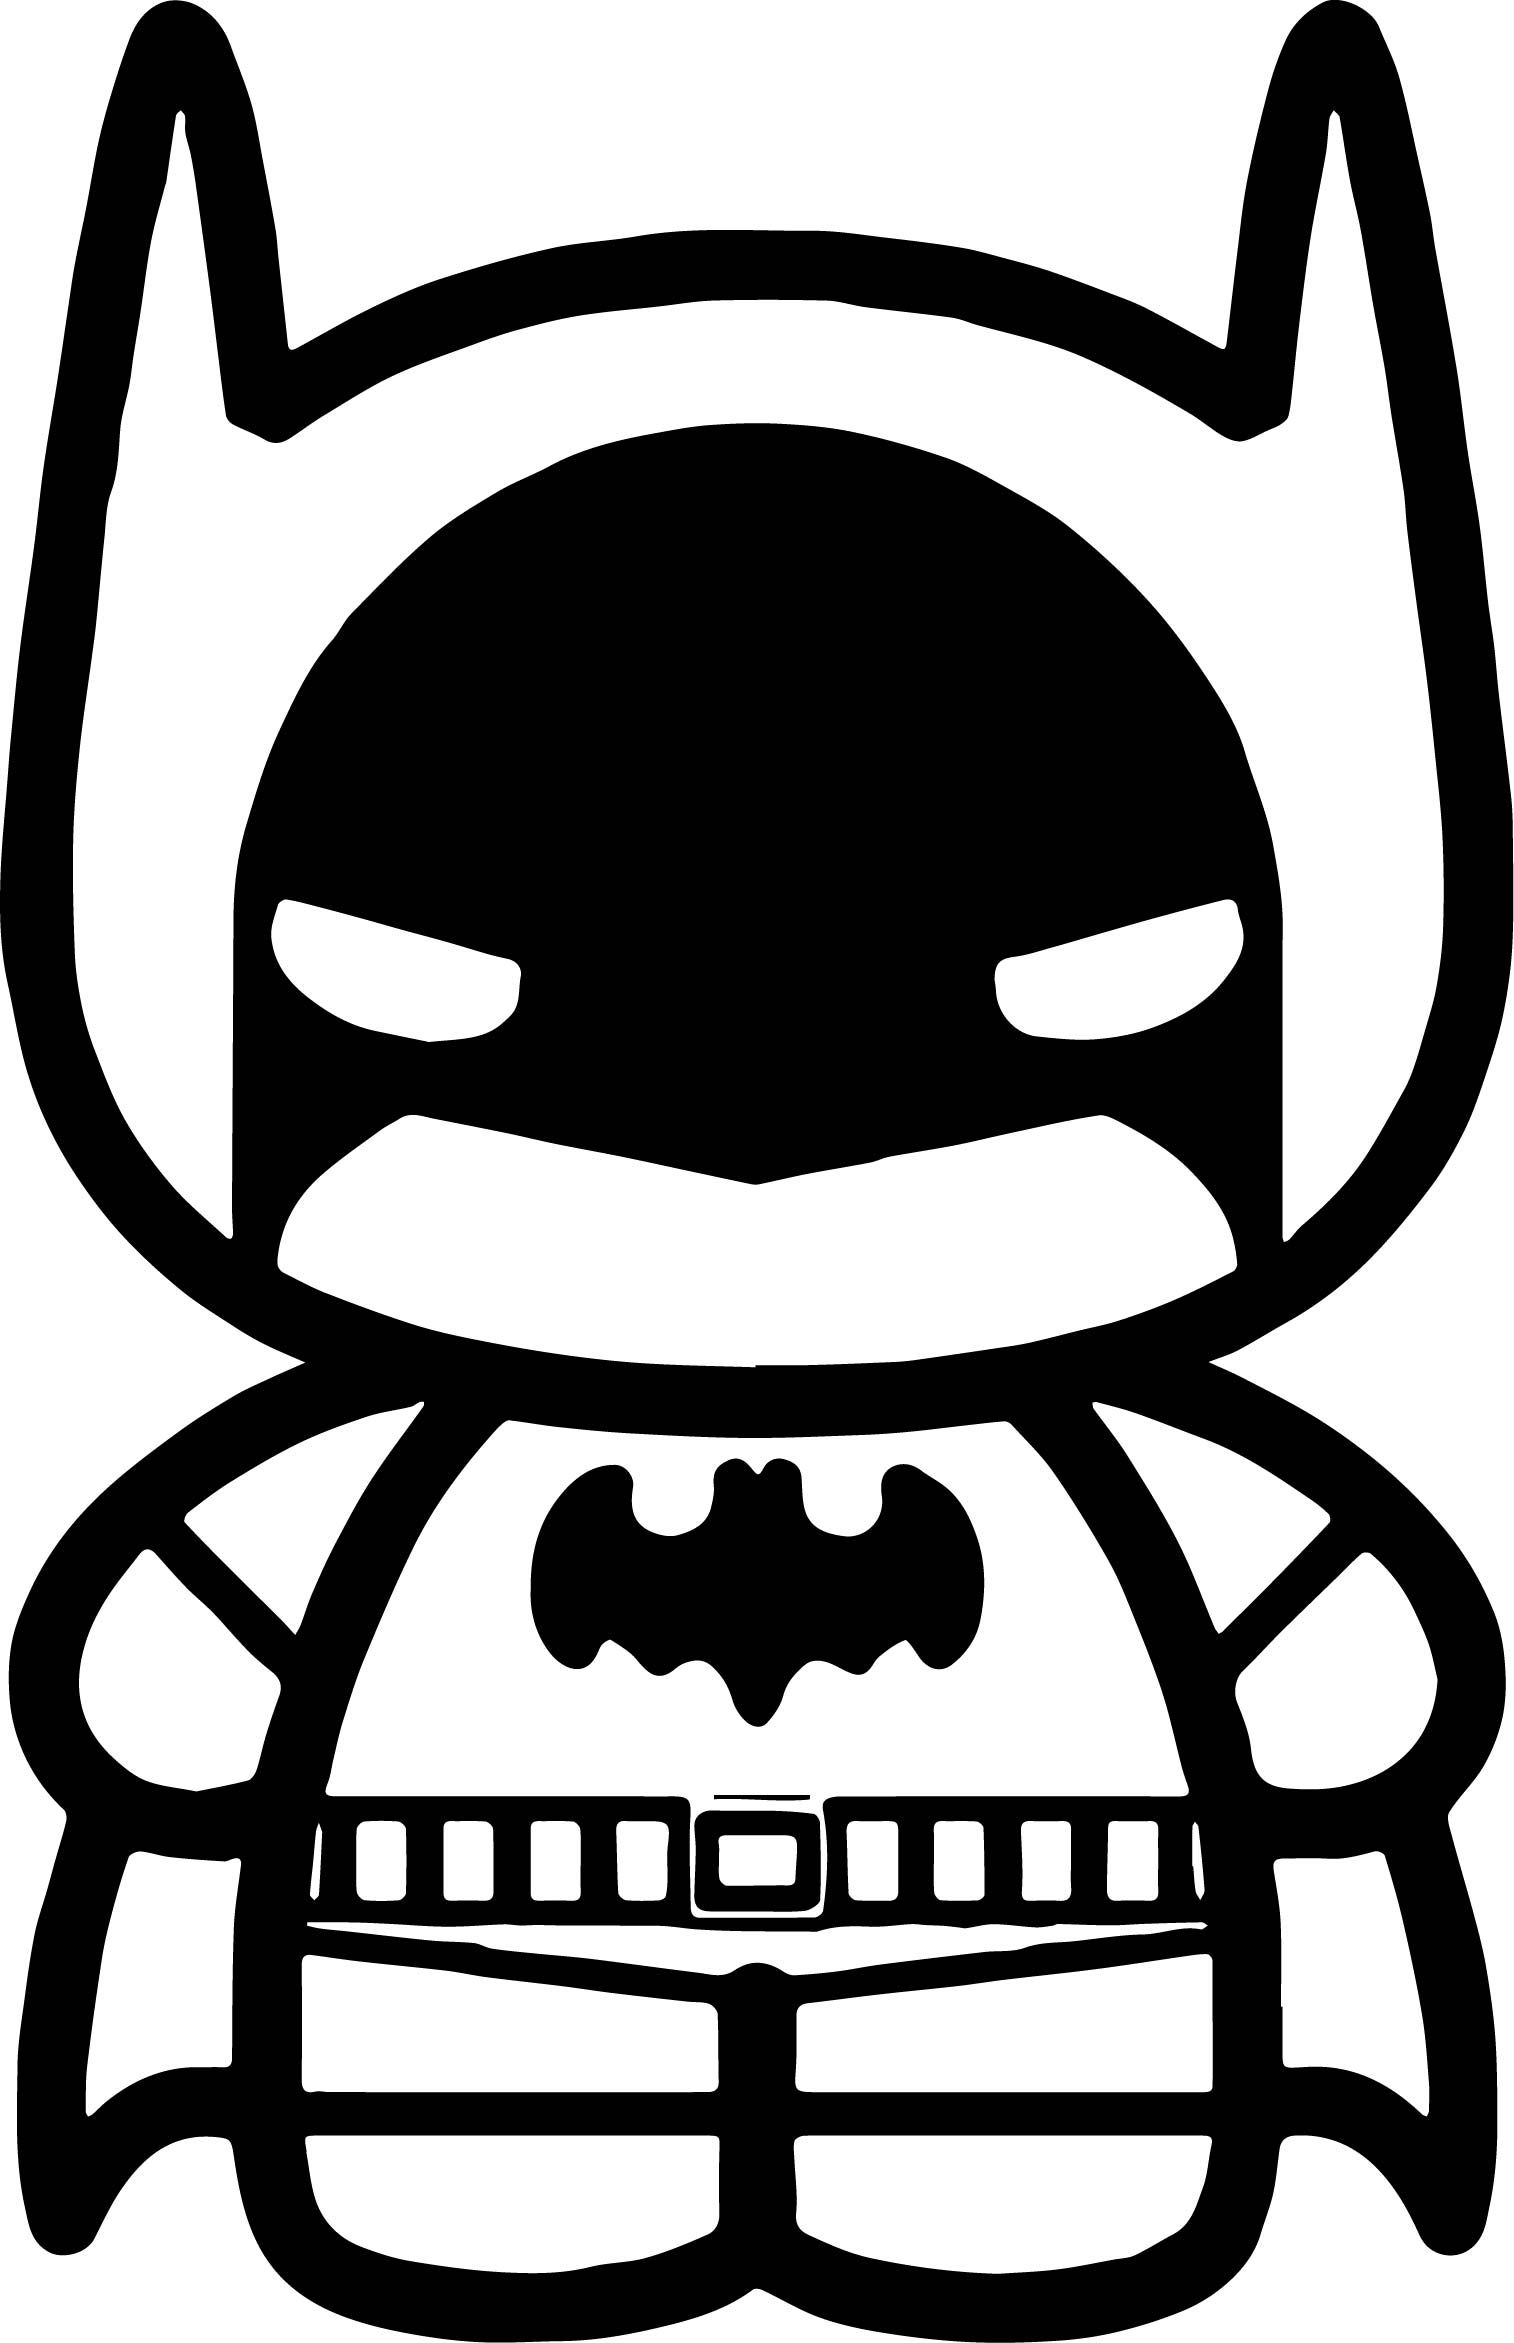 Nice Chibi Cute Batman Coloring Page Batman Coloring Pages Cute Batman Coloring Pages